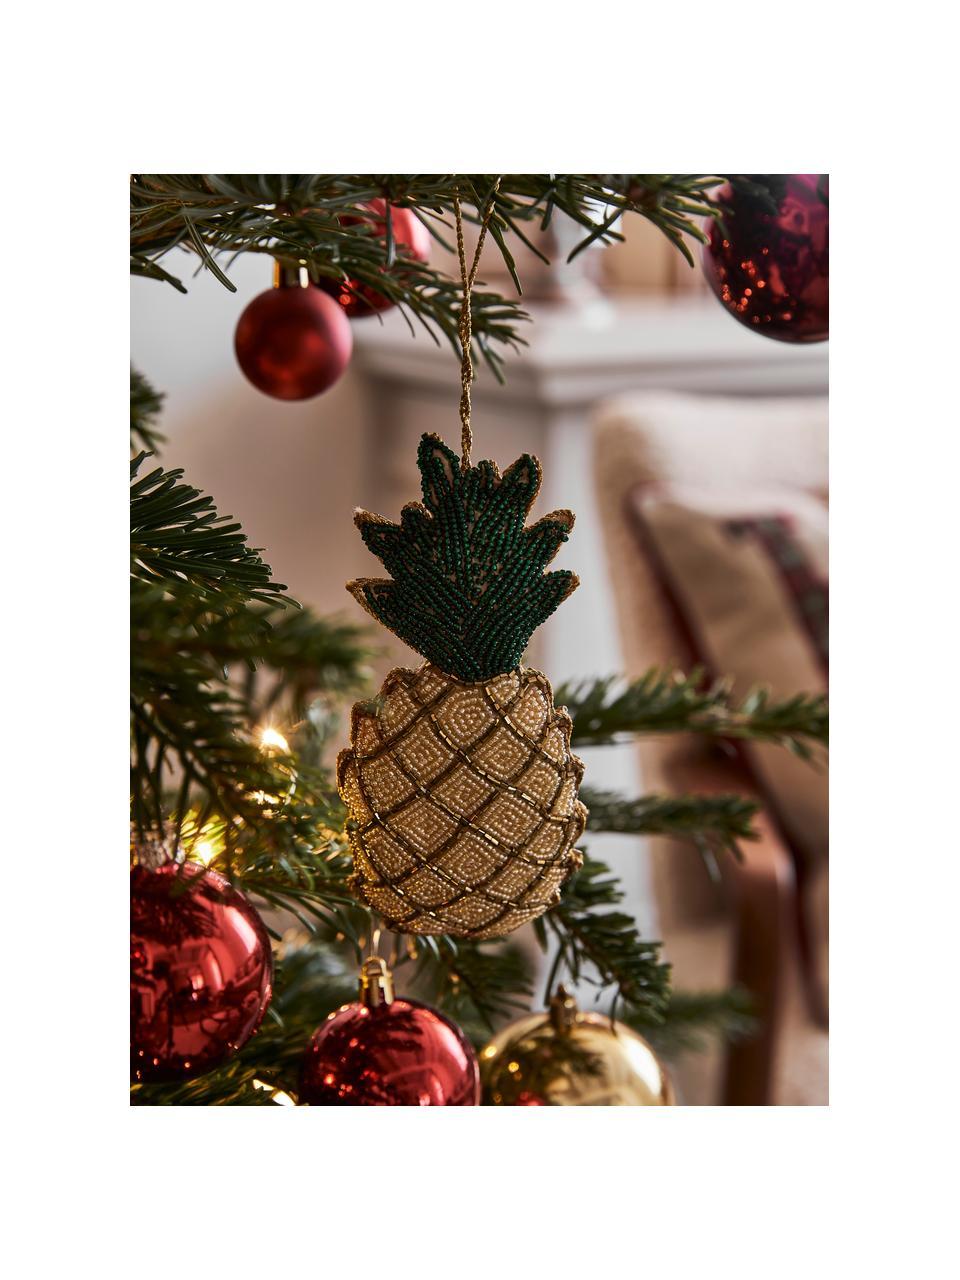 Baumanhänger Pineapple H 16 cm, Gelb, Grün, Goldfarben, 7 x 16 cm